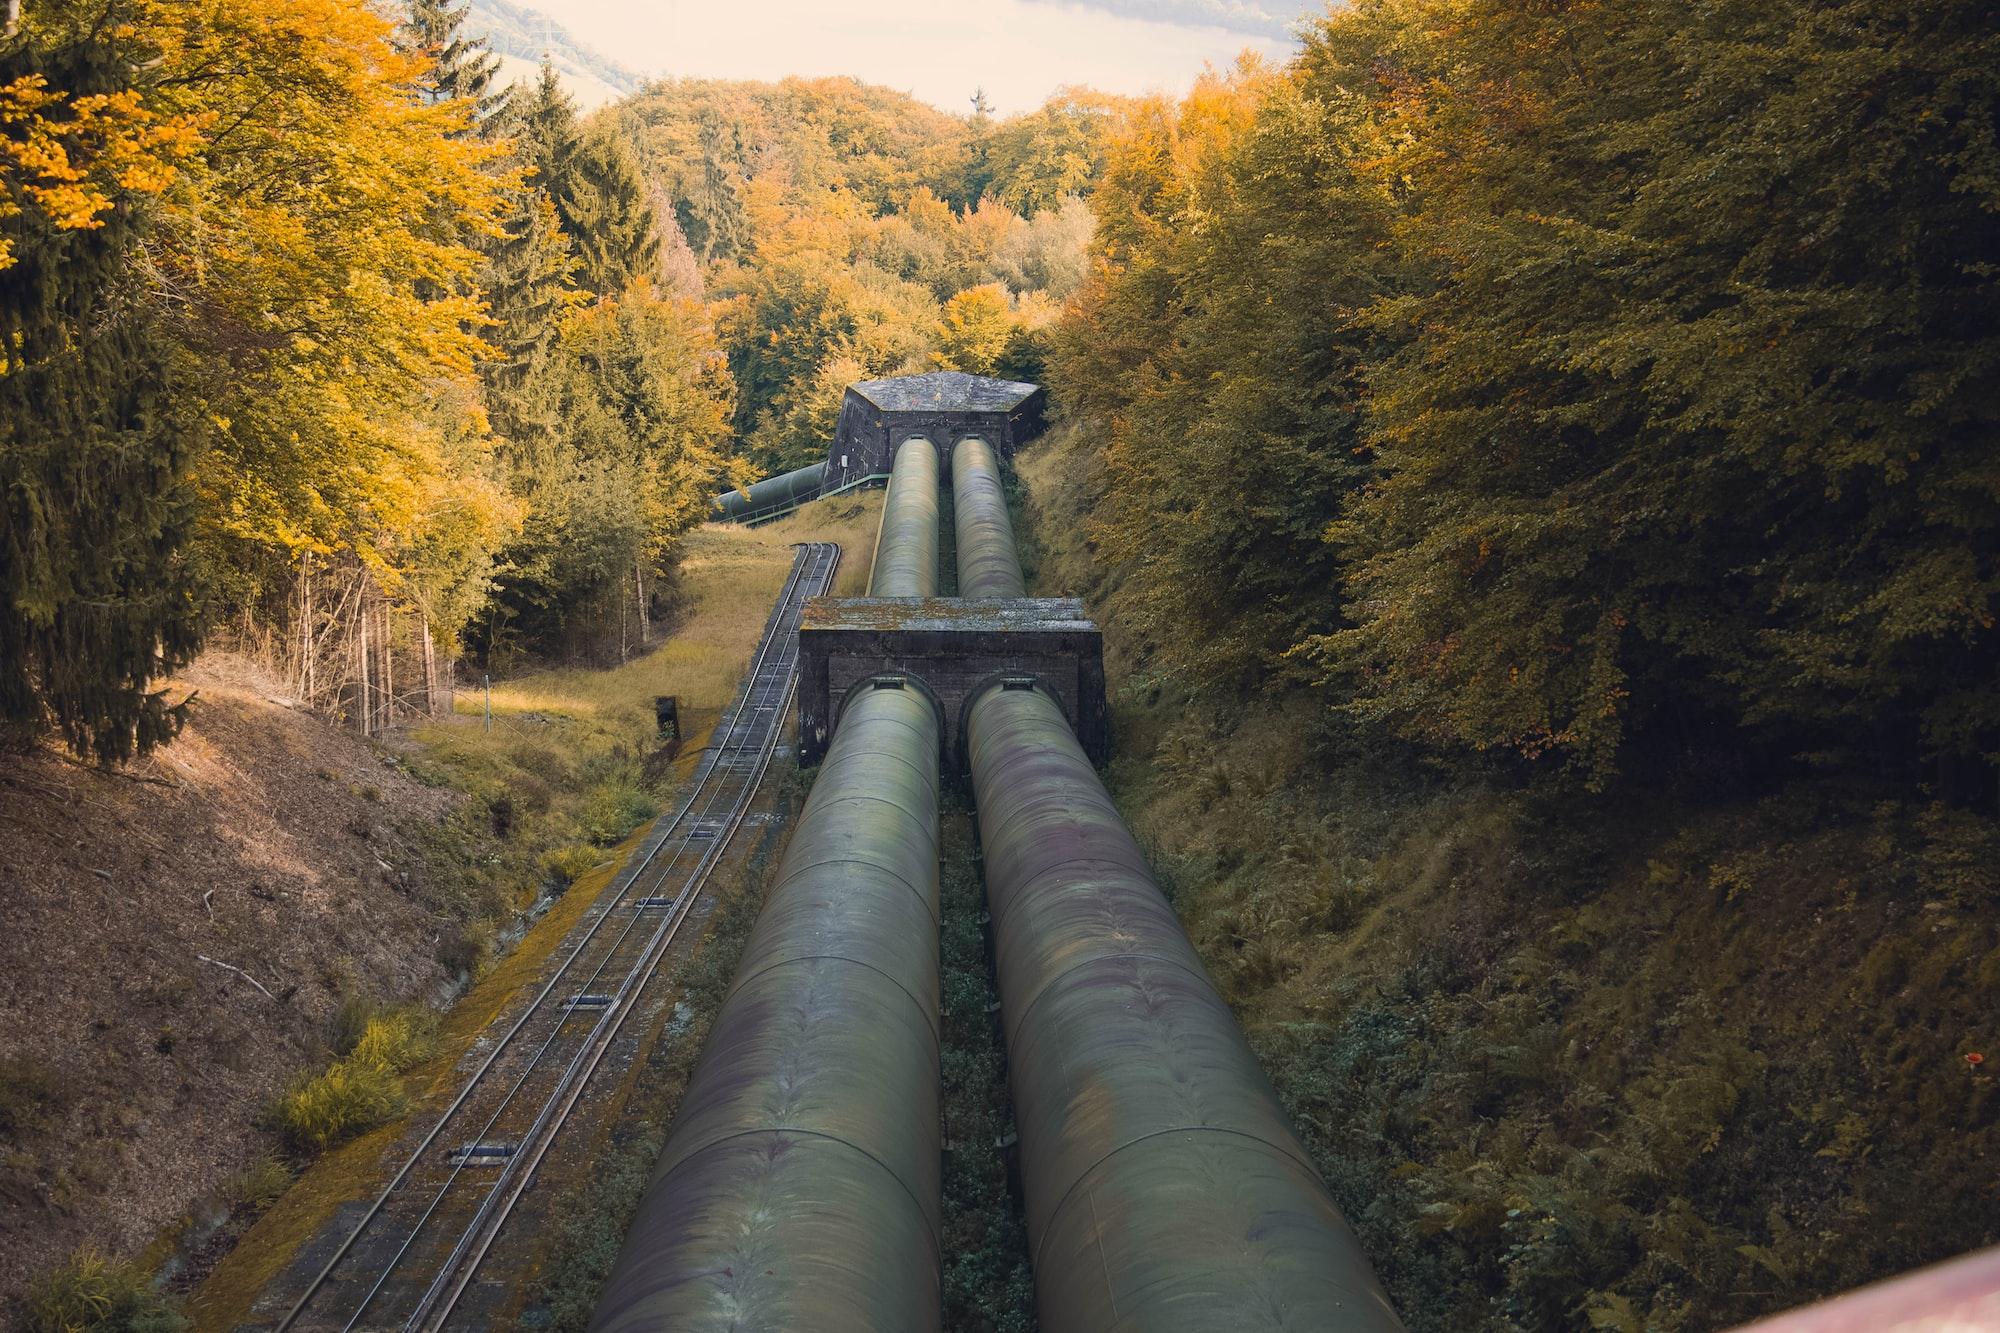 Ukraine's Low-Carbon Gas Potential and the European Union